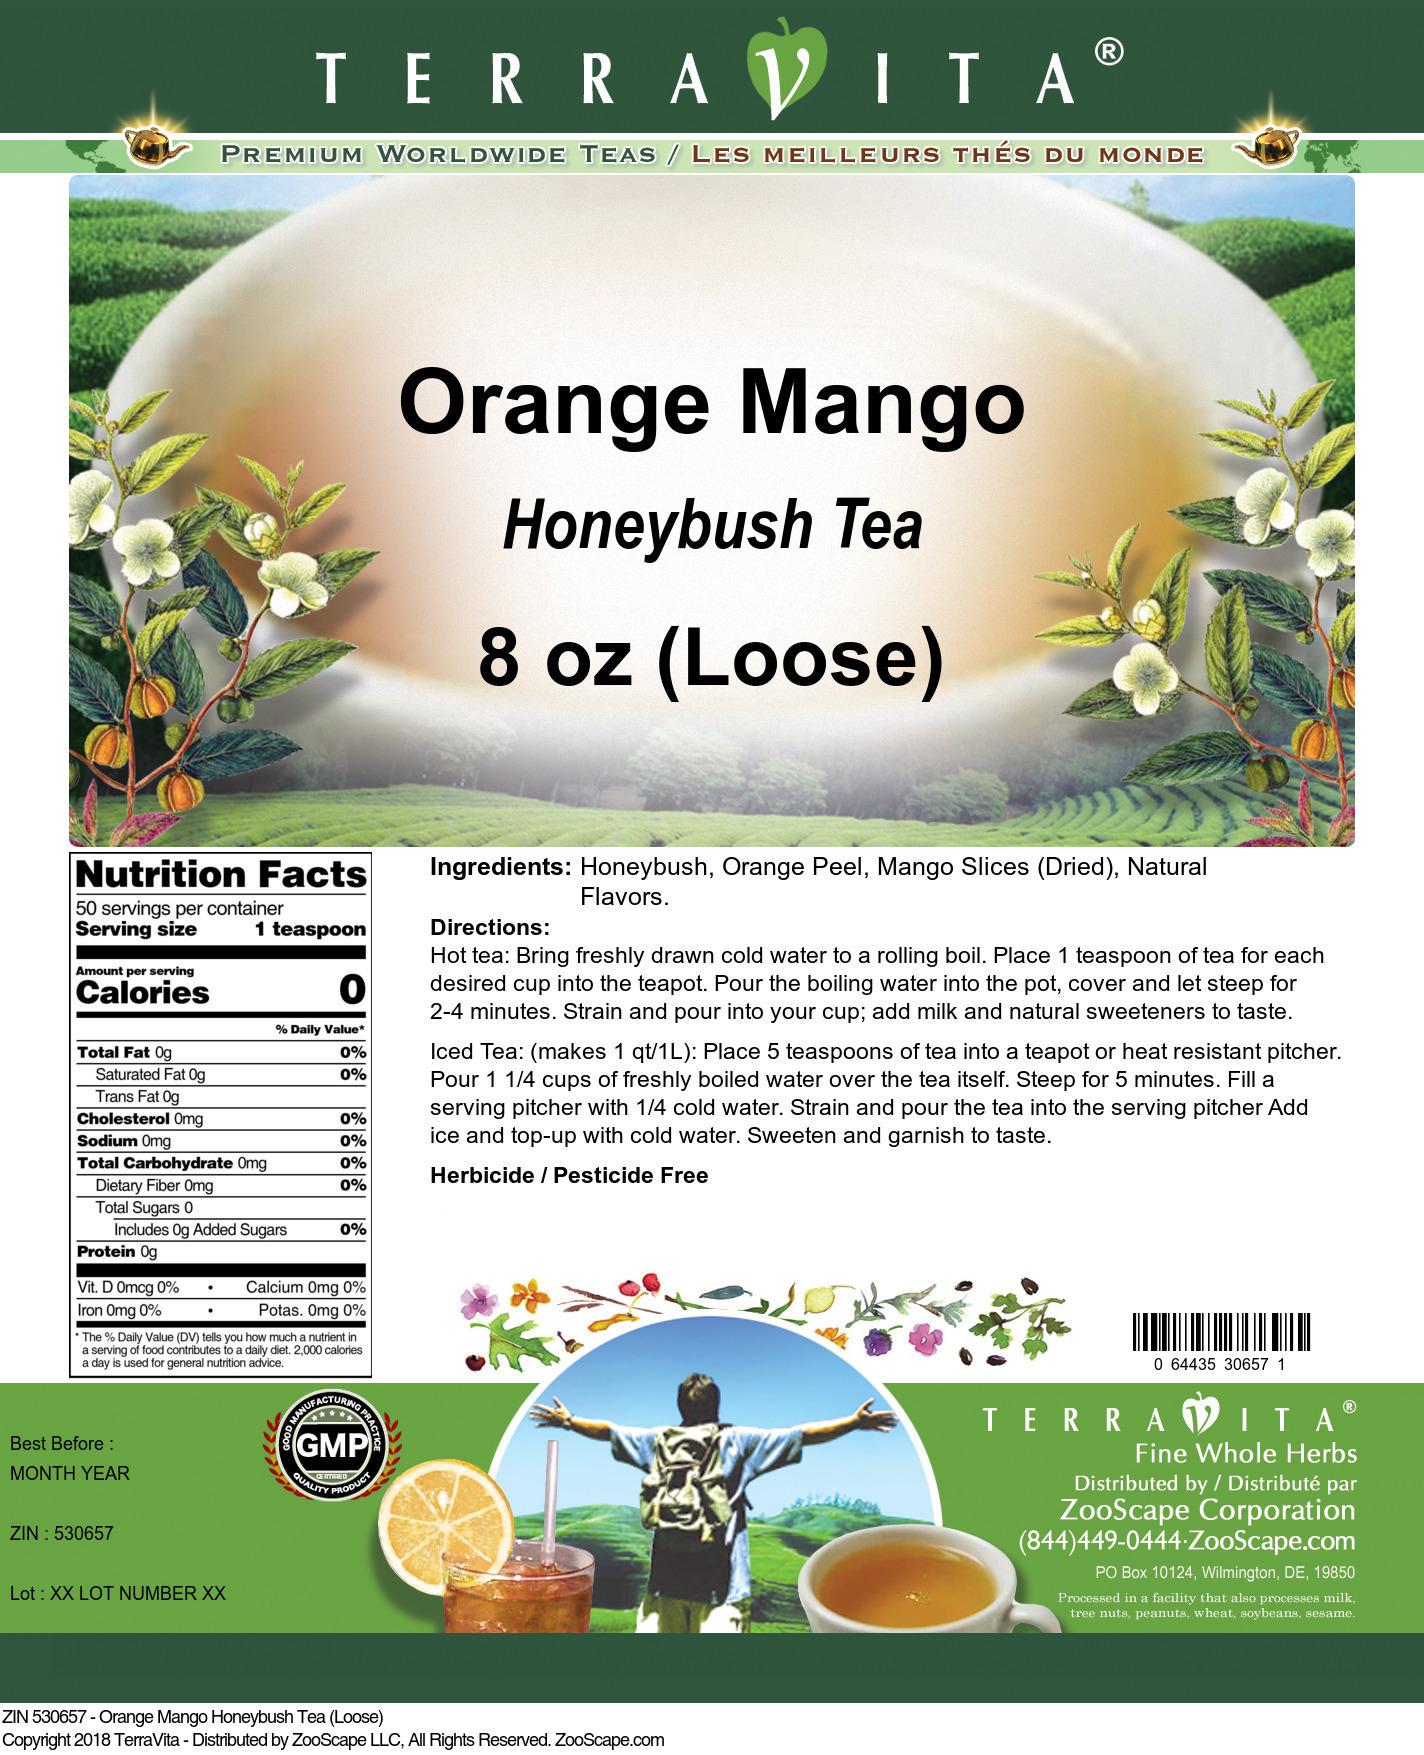 Orange Mango Honeybush Tea